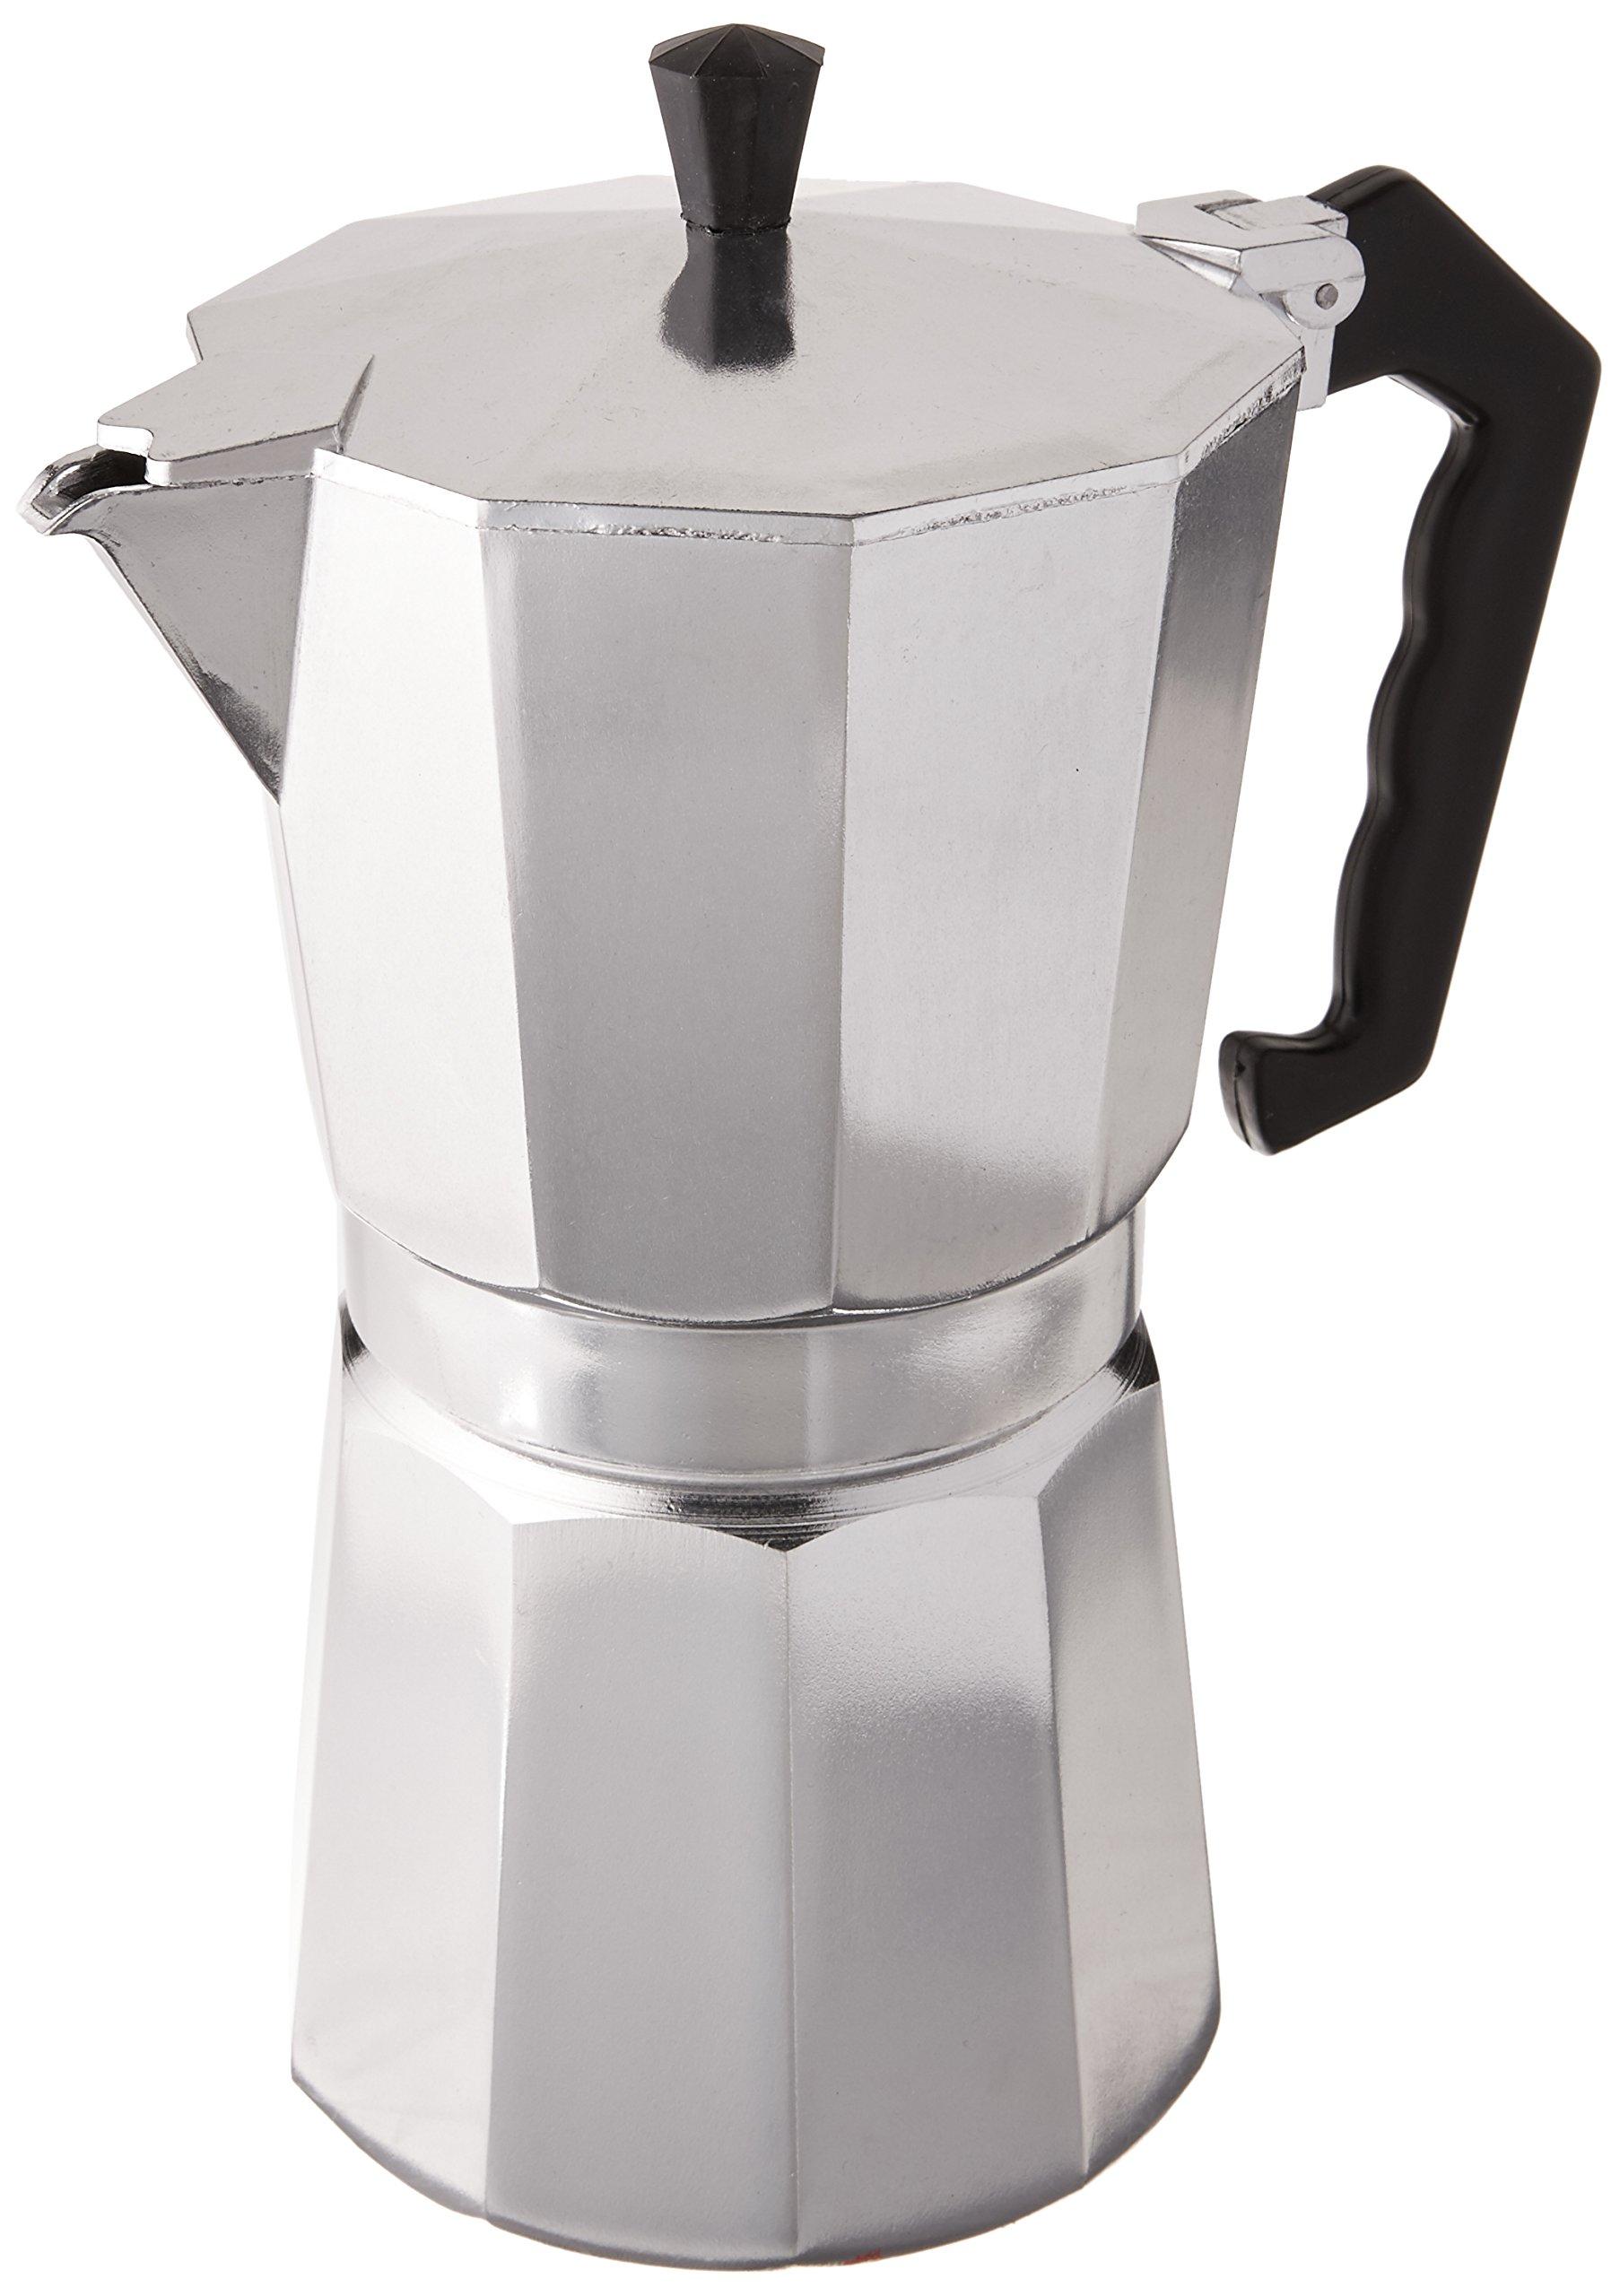 Norpro 8-Cup Espresso Maker